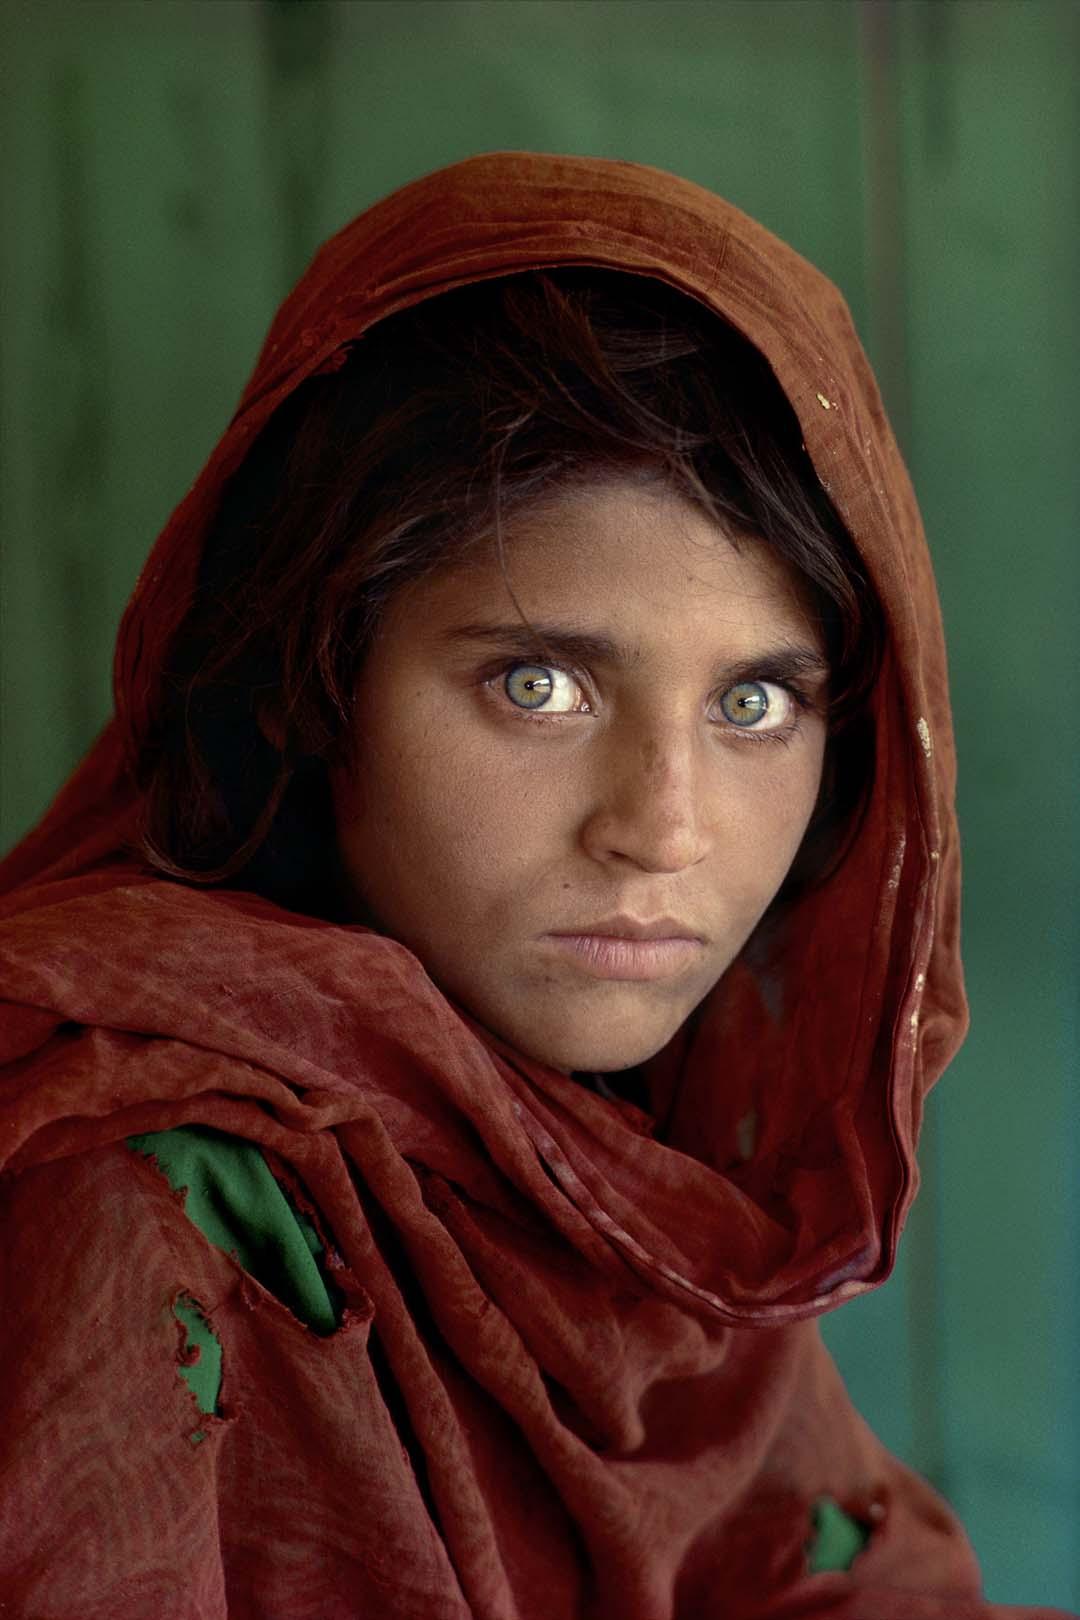 7f348039e Sharbat Gula, Afghan Girl, at Nasir Bagh refugee camp near Peshawar,  Pakistan,